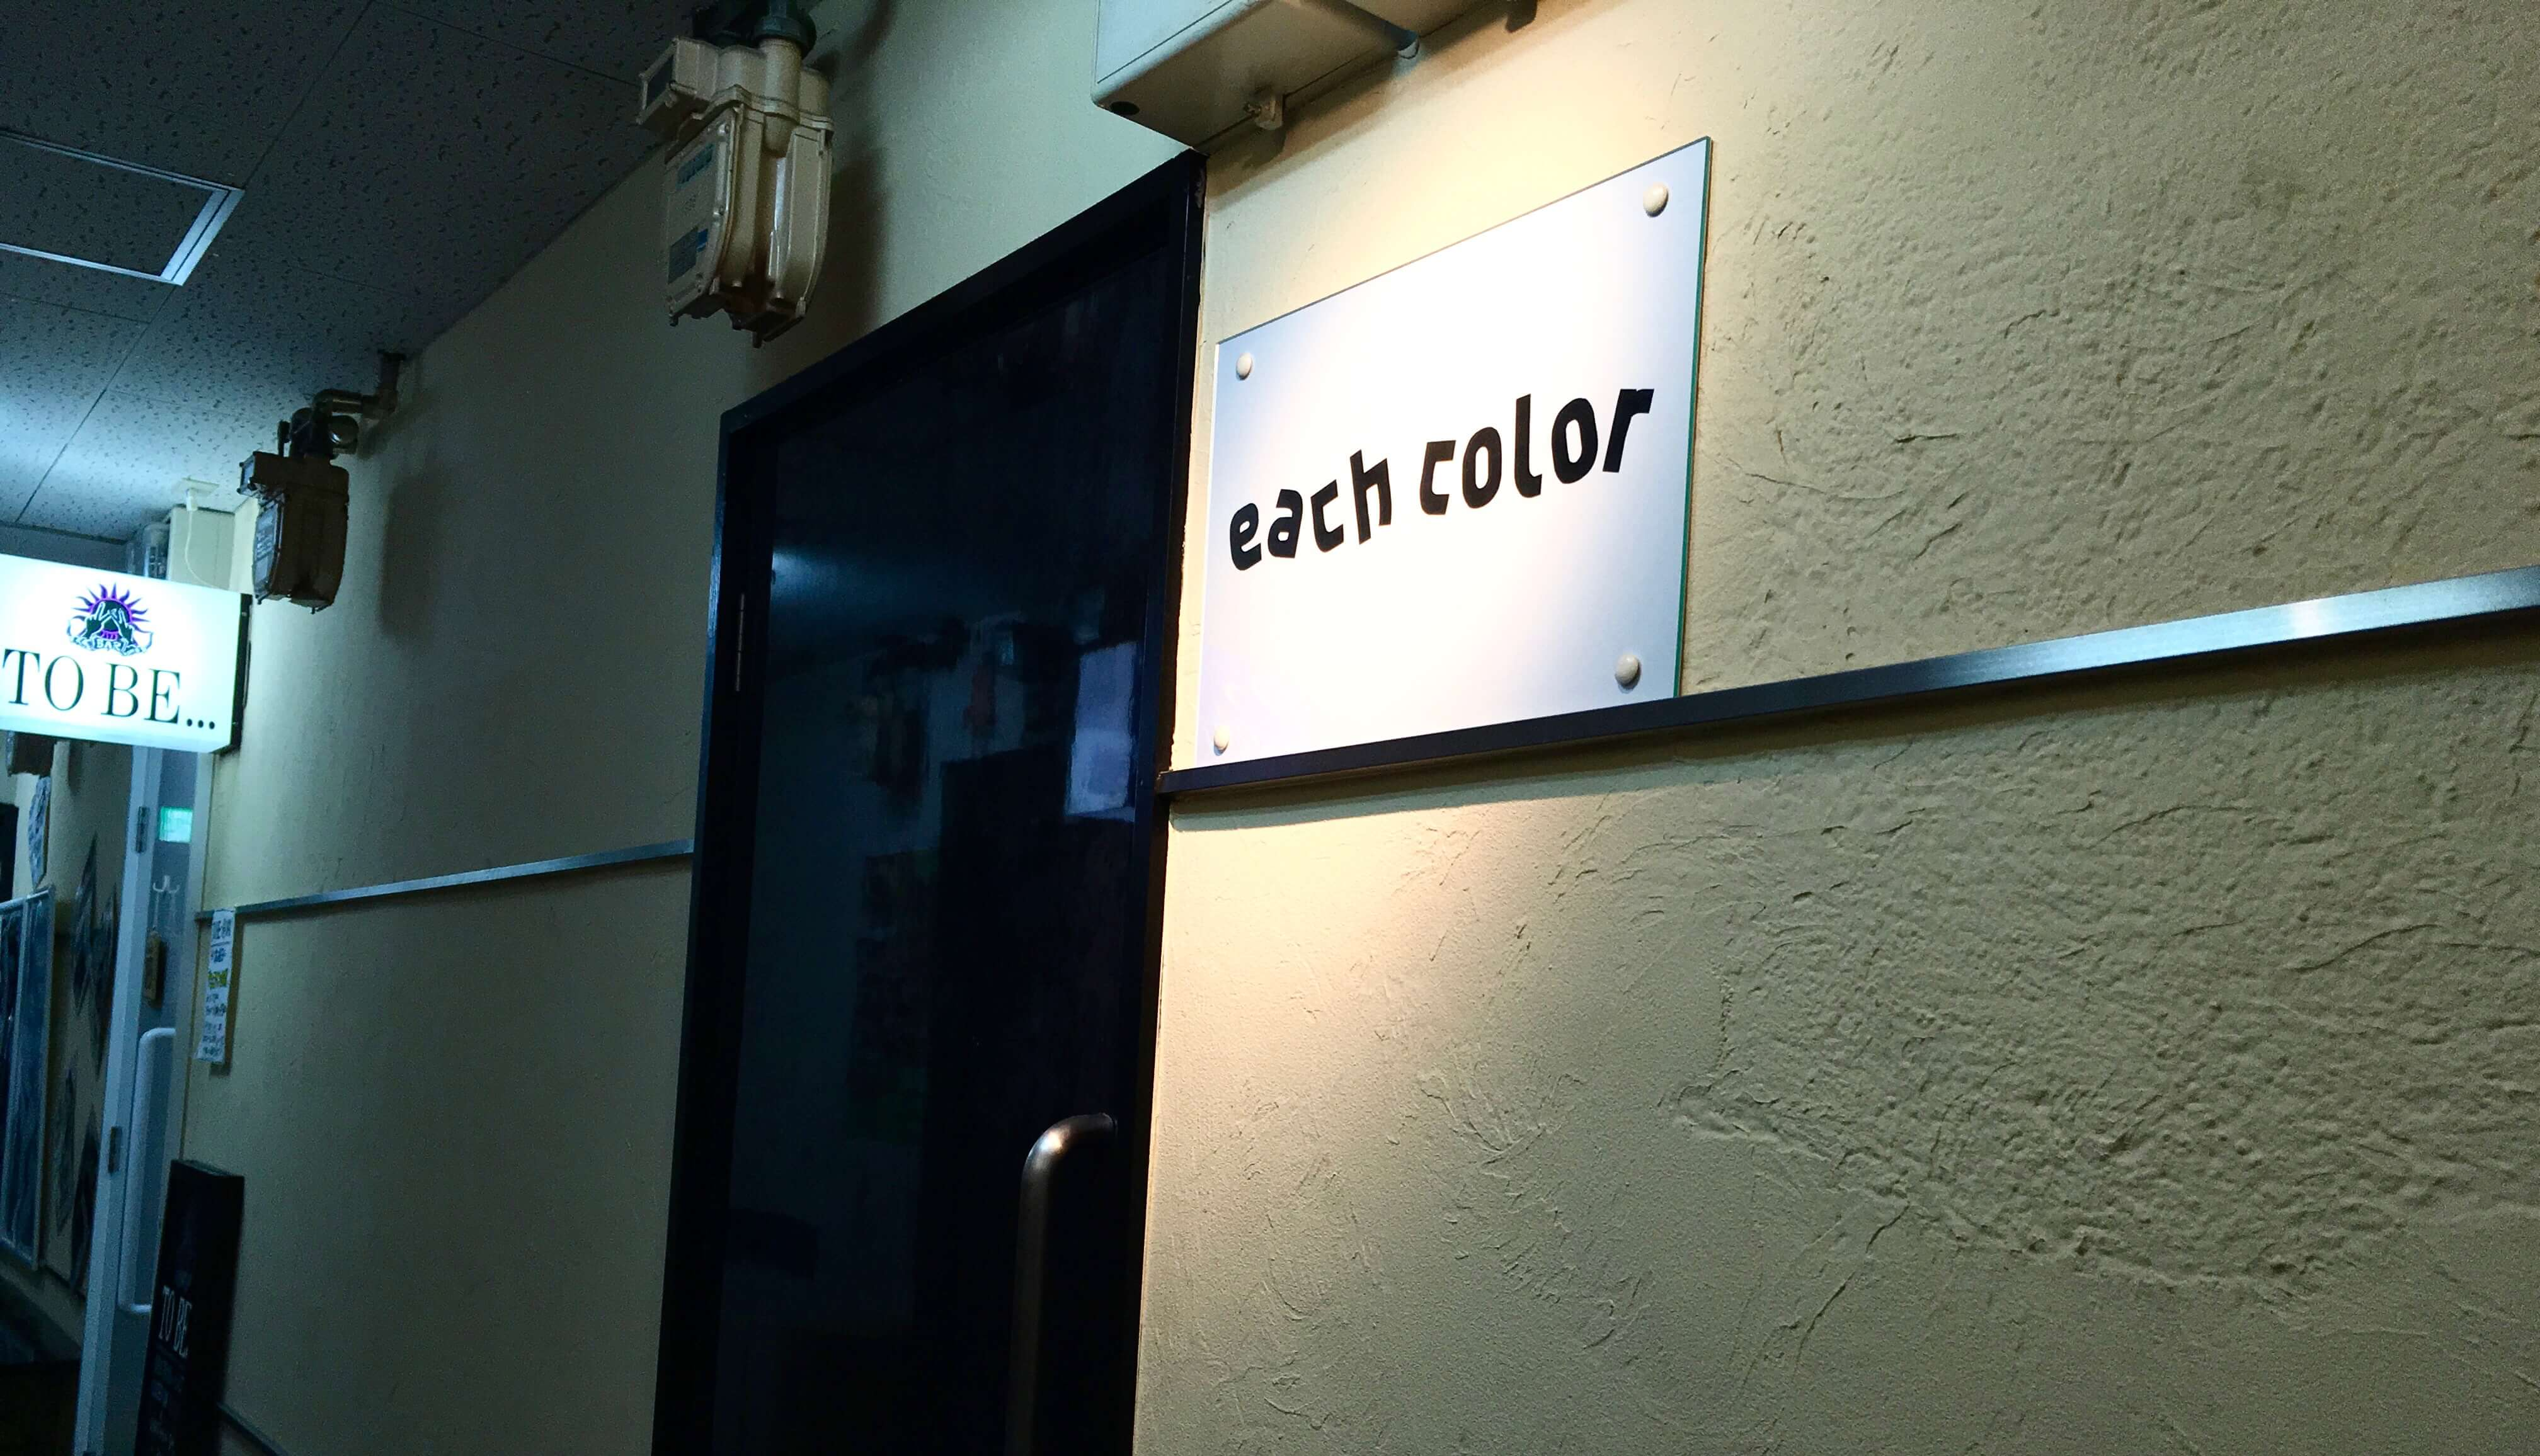 each color レズビアンバー